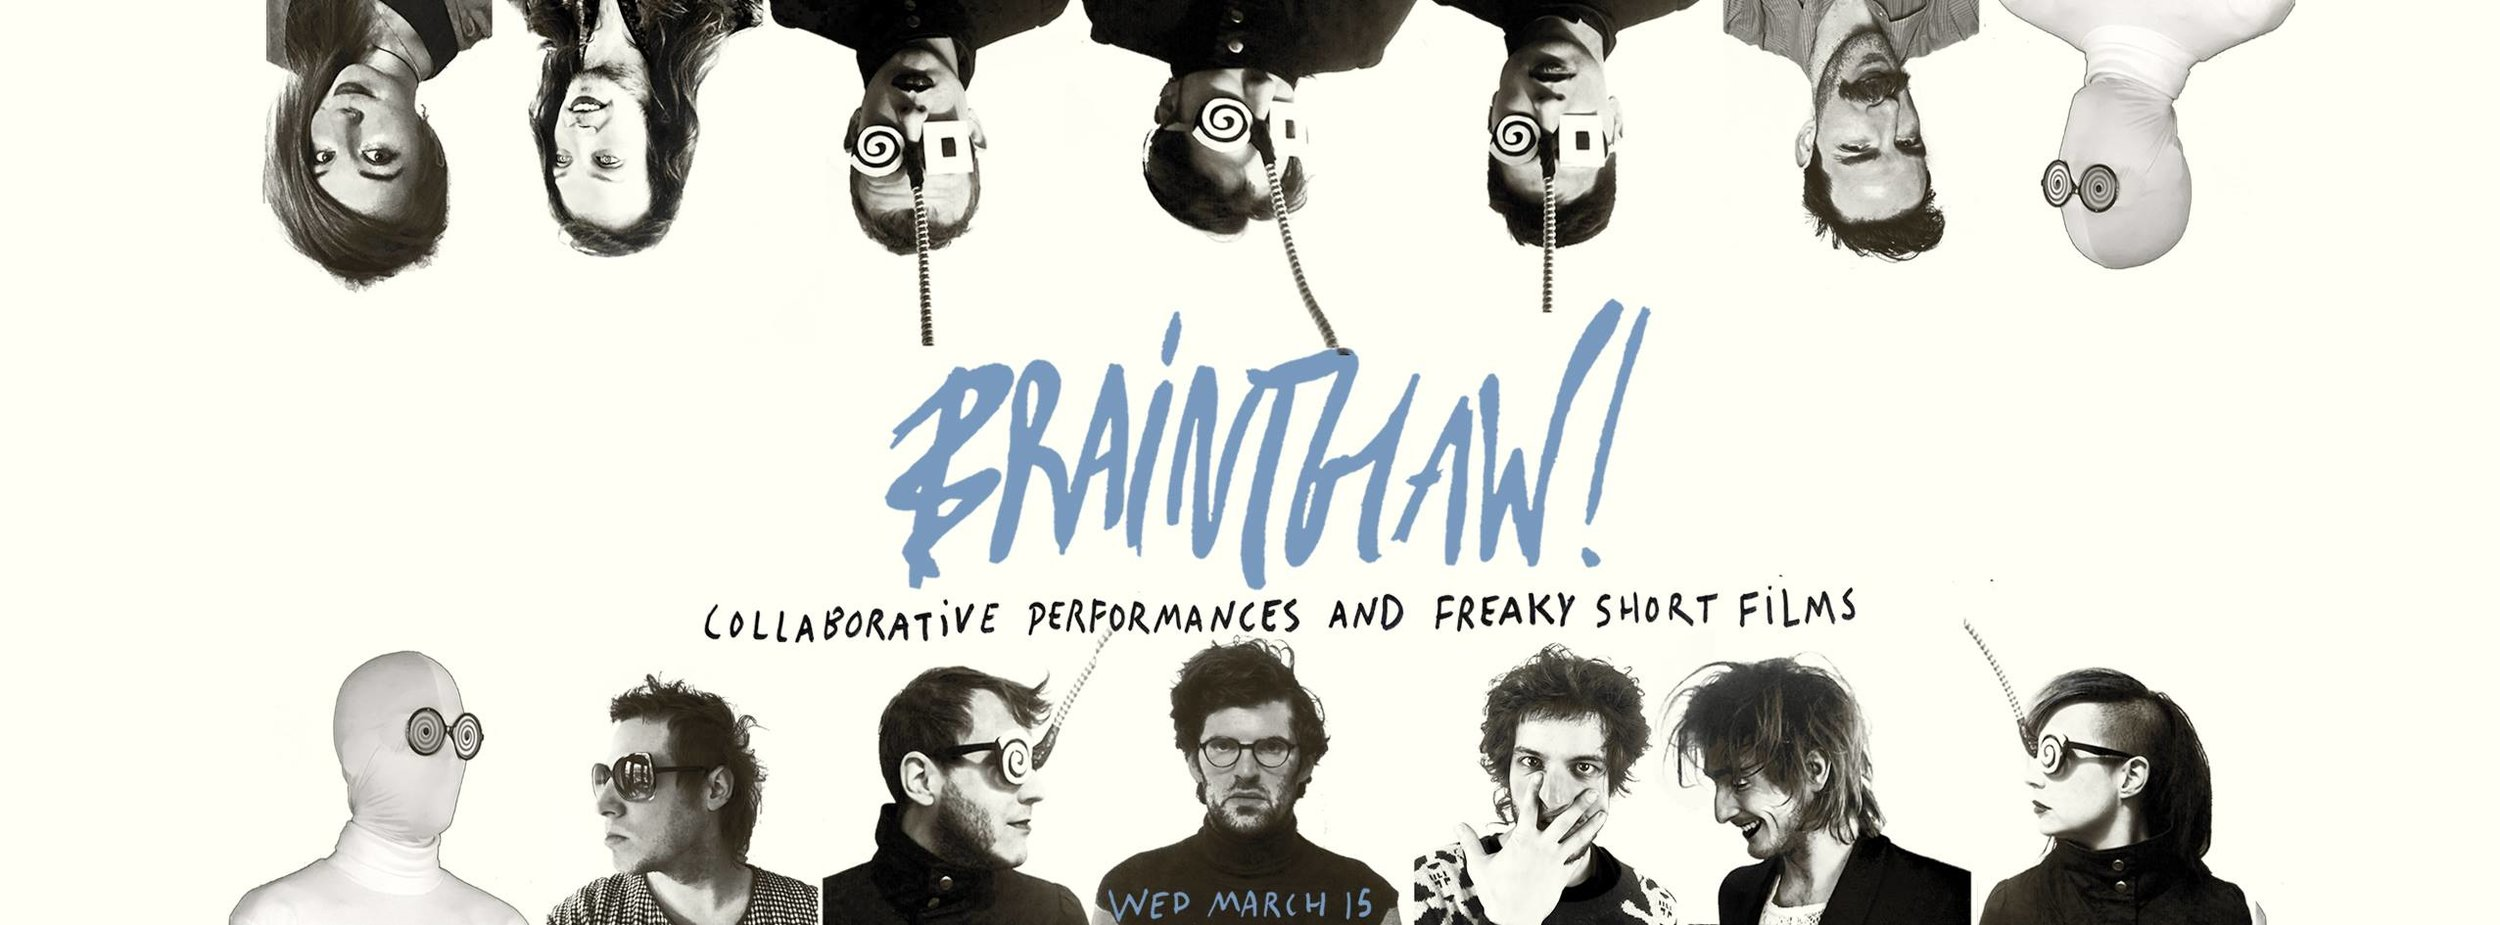 brainthaw poster